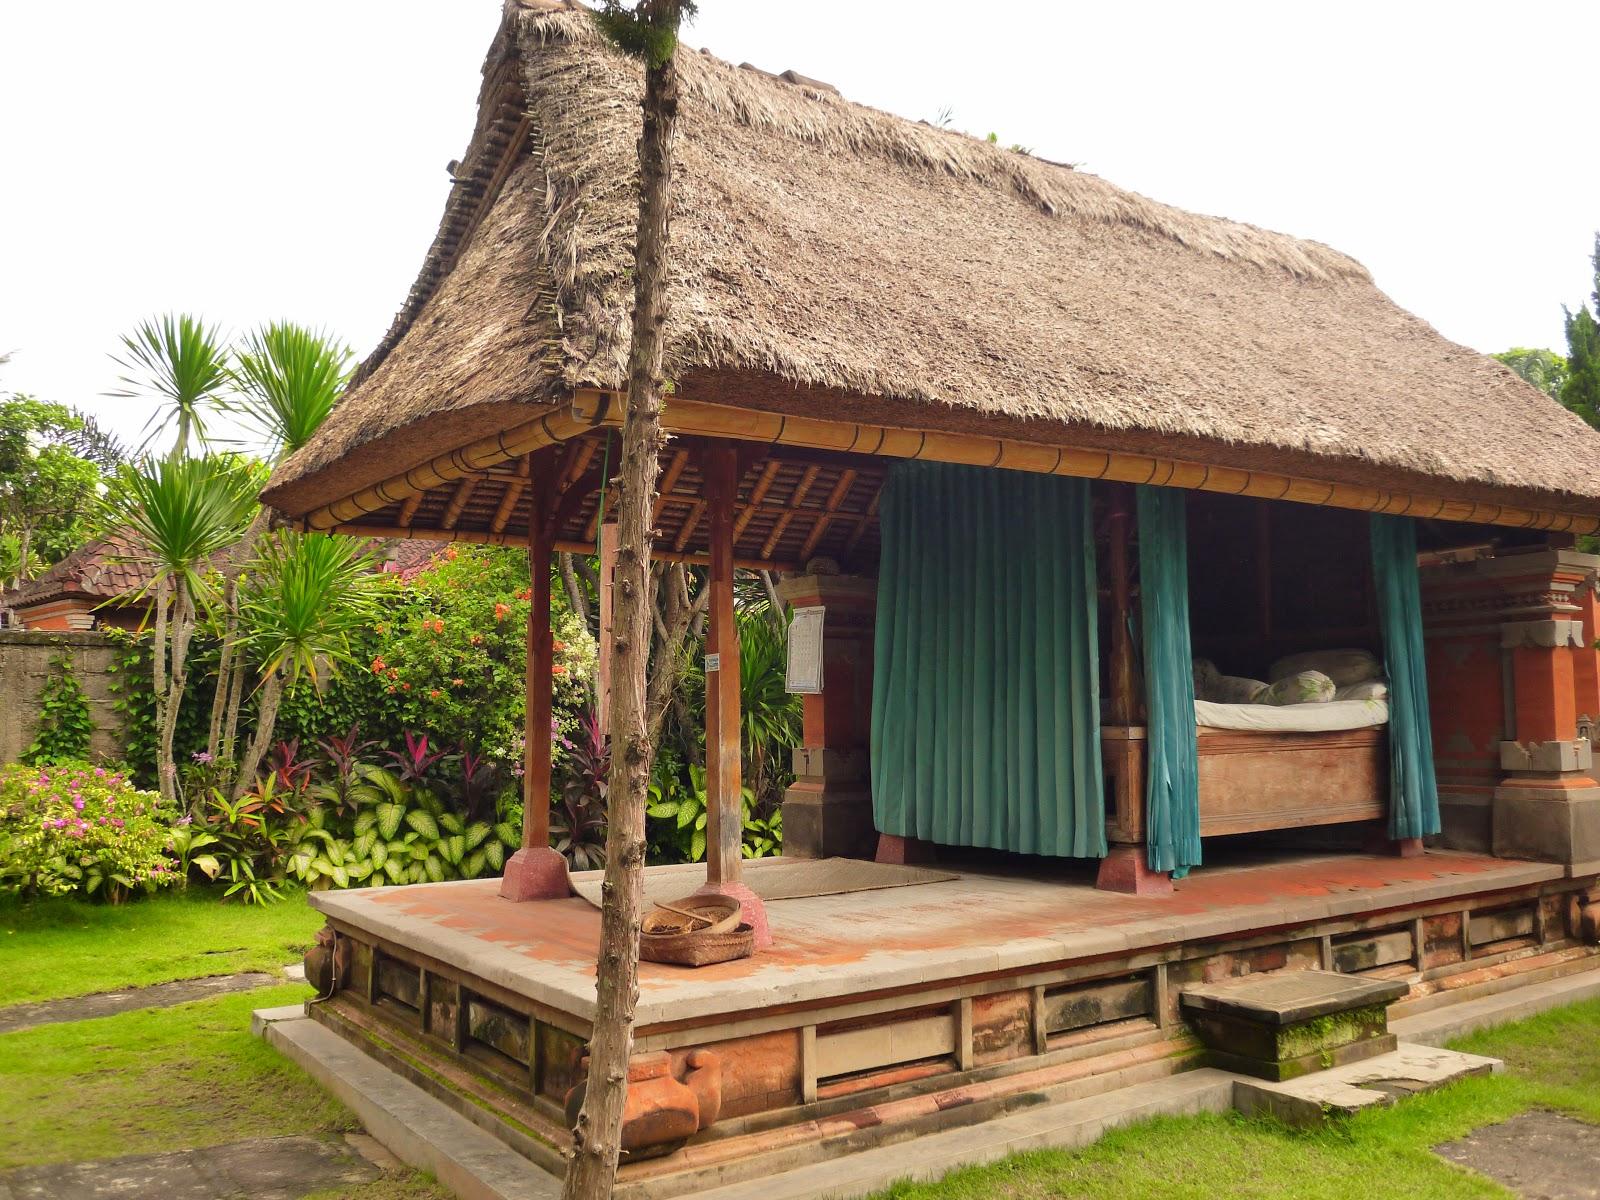 mehmet erdogdu ile seyahat d u00fcnyas u0131 bali ve ubud foto Modern Bali Houses Balinese Hut